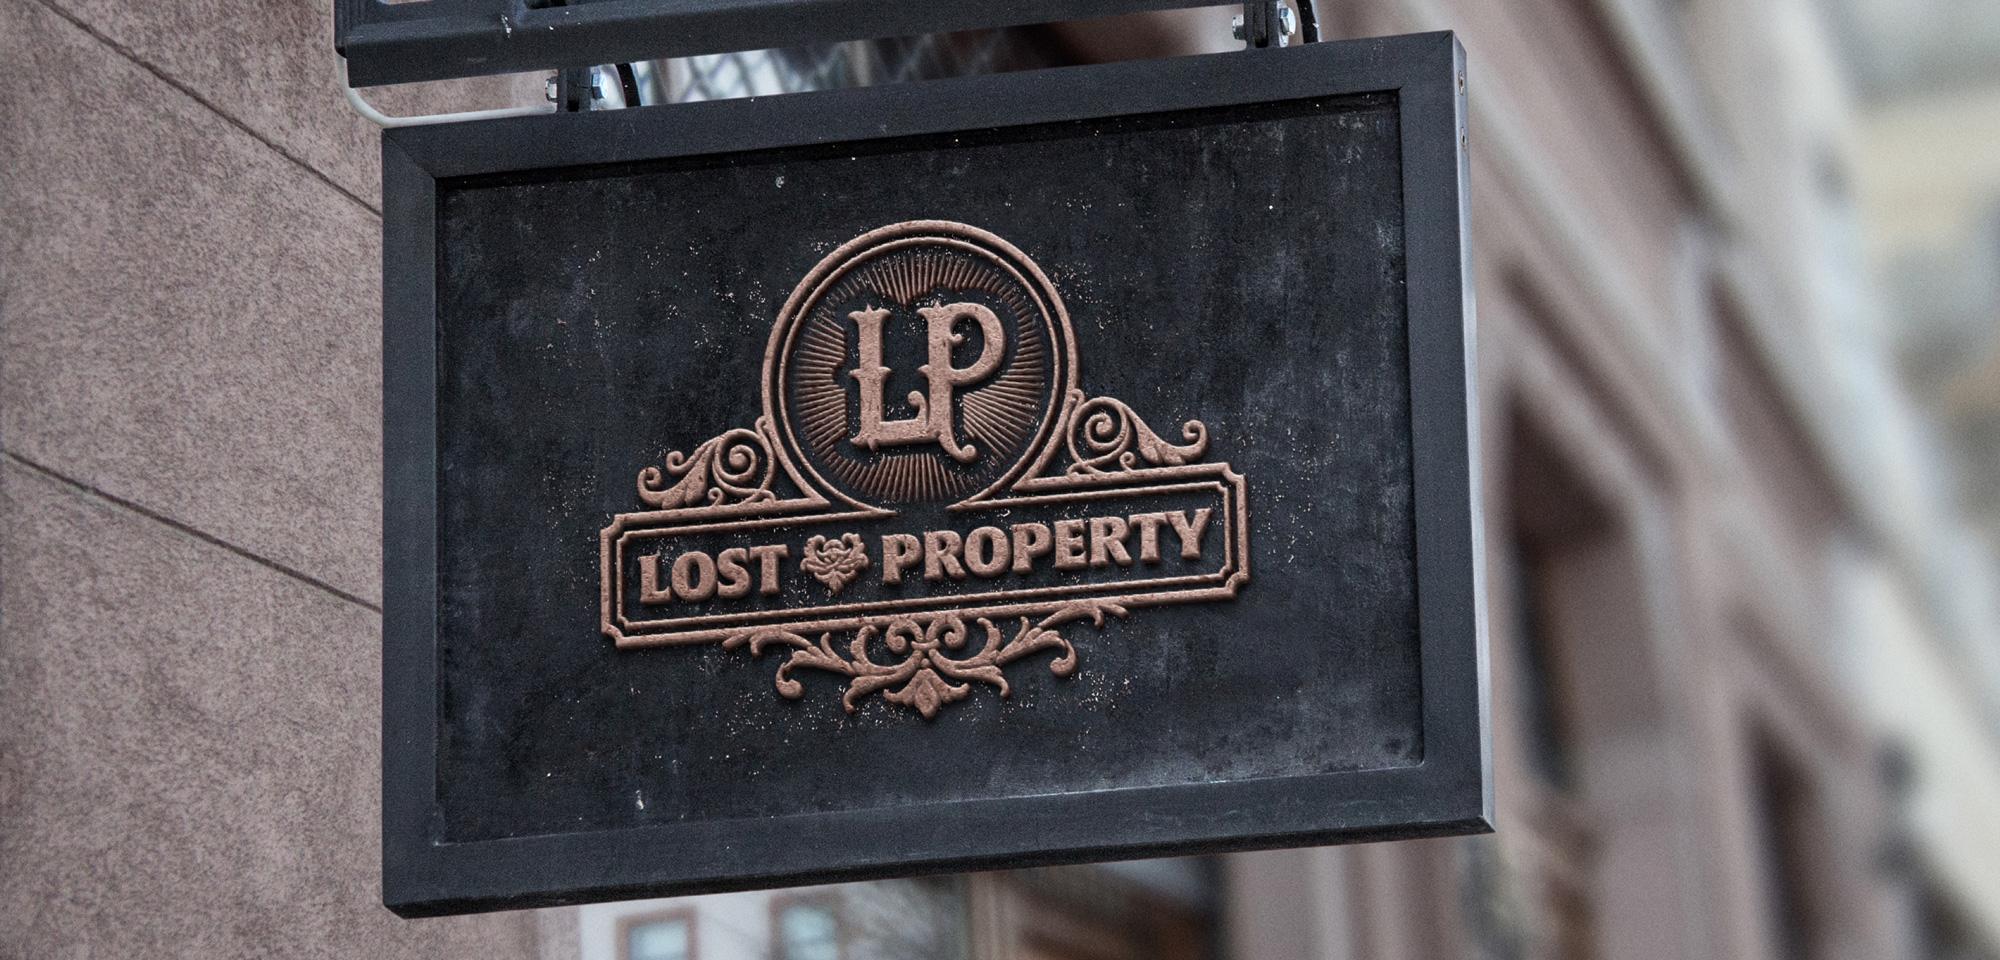 Lost property logo shop sign